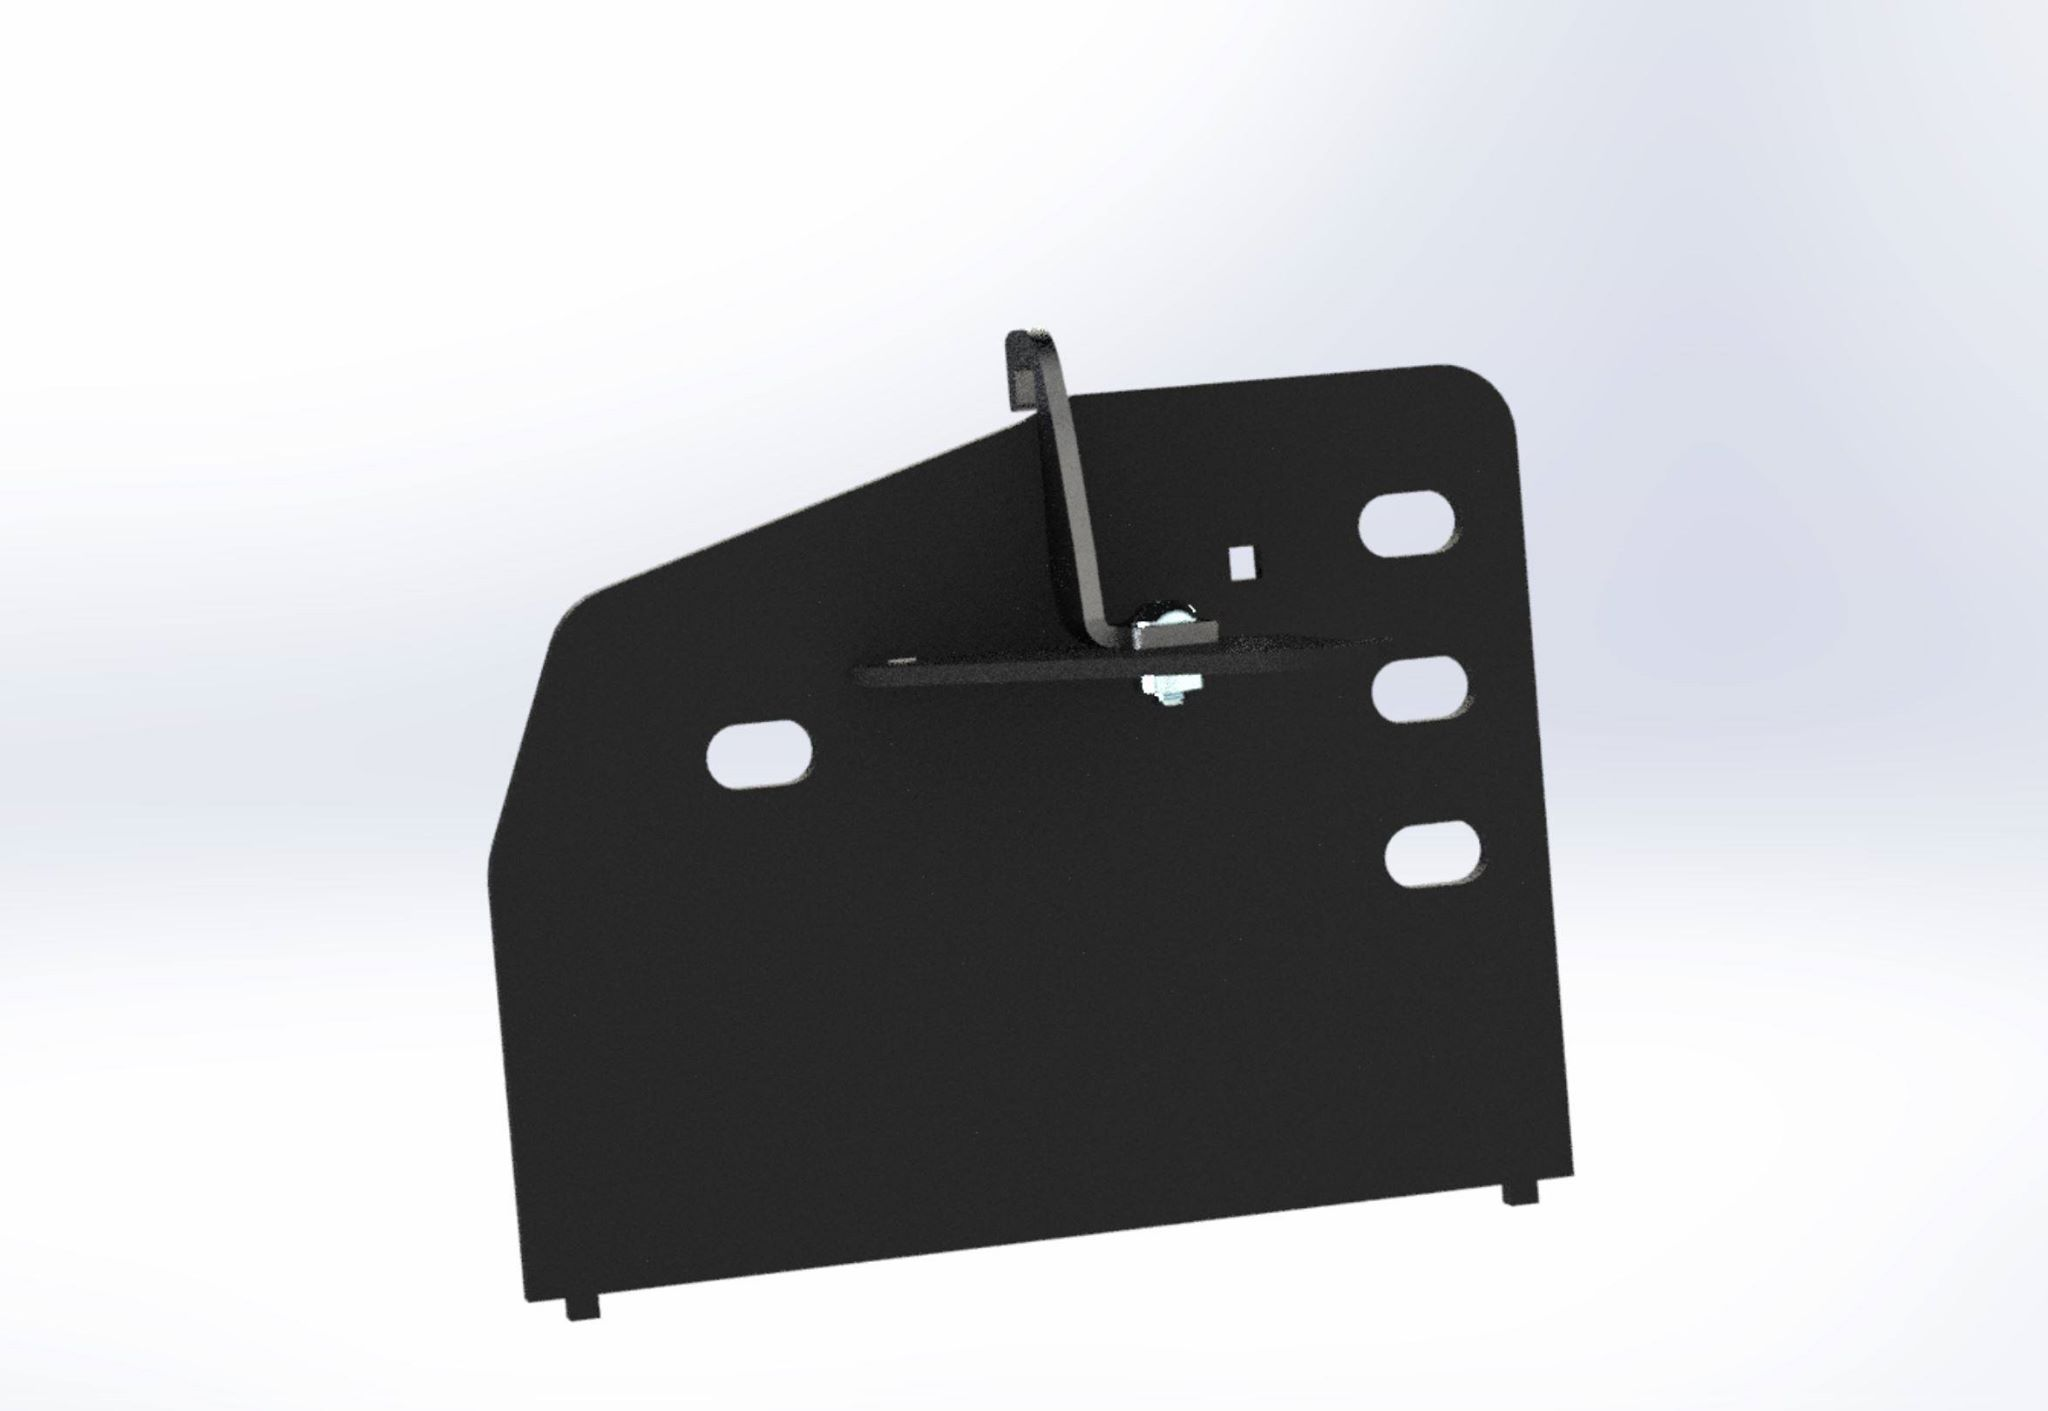 *REVIEW* Artec Industries Venture Bumper-horn1-jpg